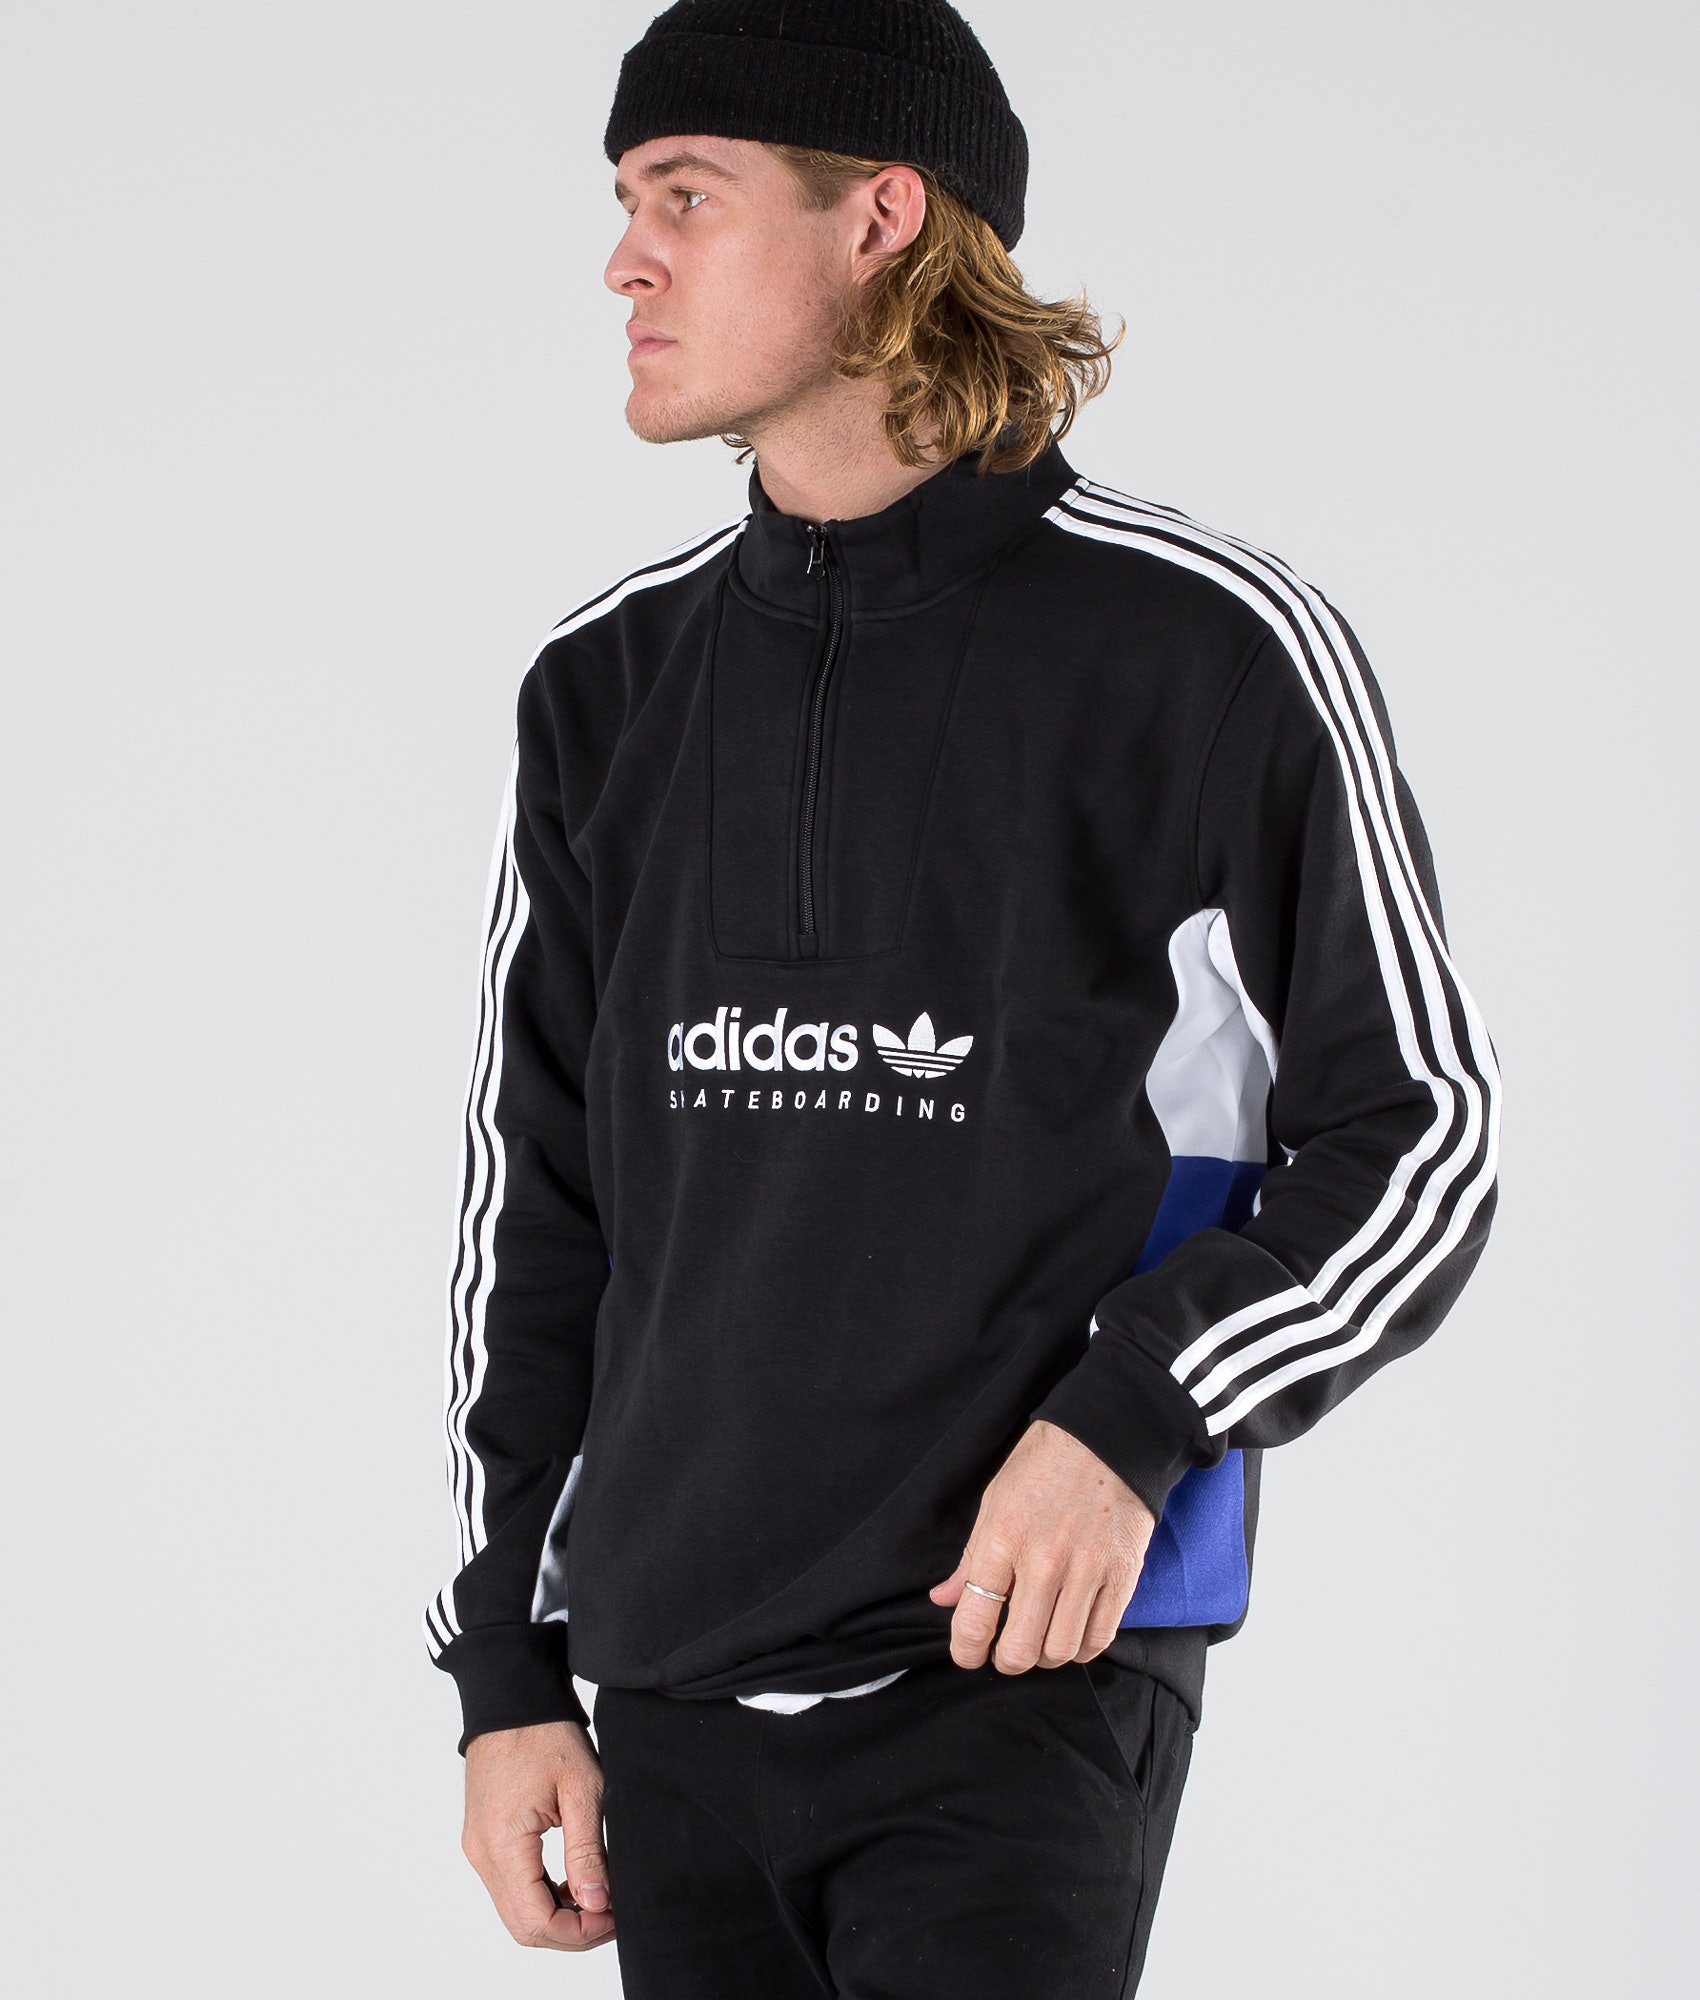 1ee7b522f3 Adidas Skateboarding Apian Sweater Black. Black White Active Blue